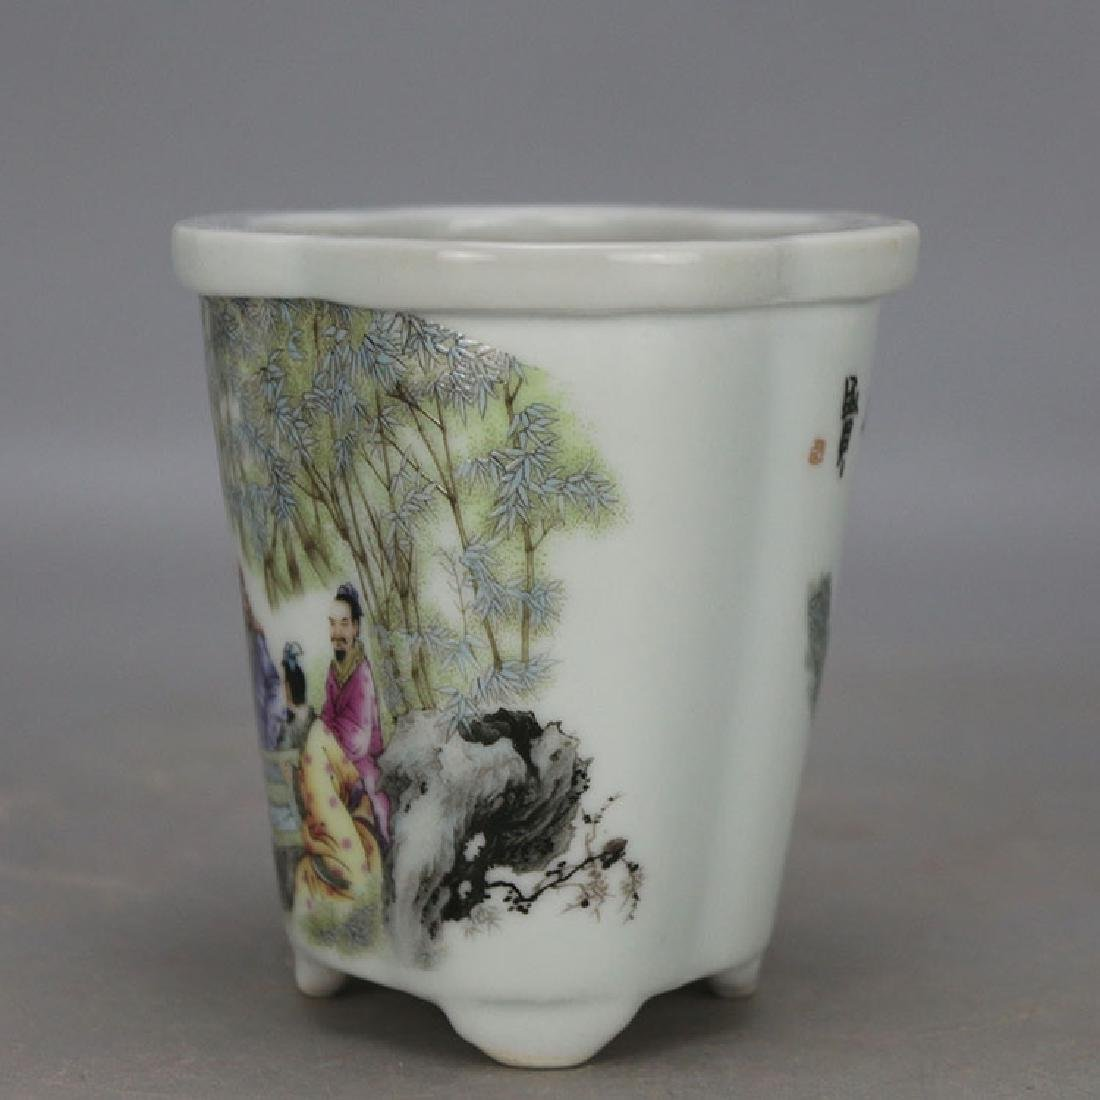 Chinese Antique Famille-Rose Porcelain Flower Pot - 3